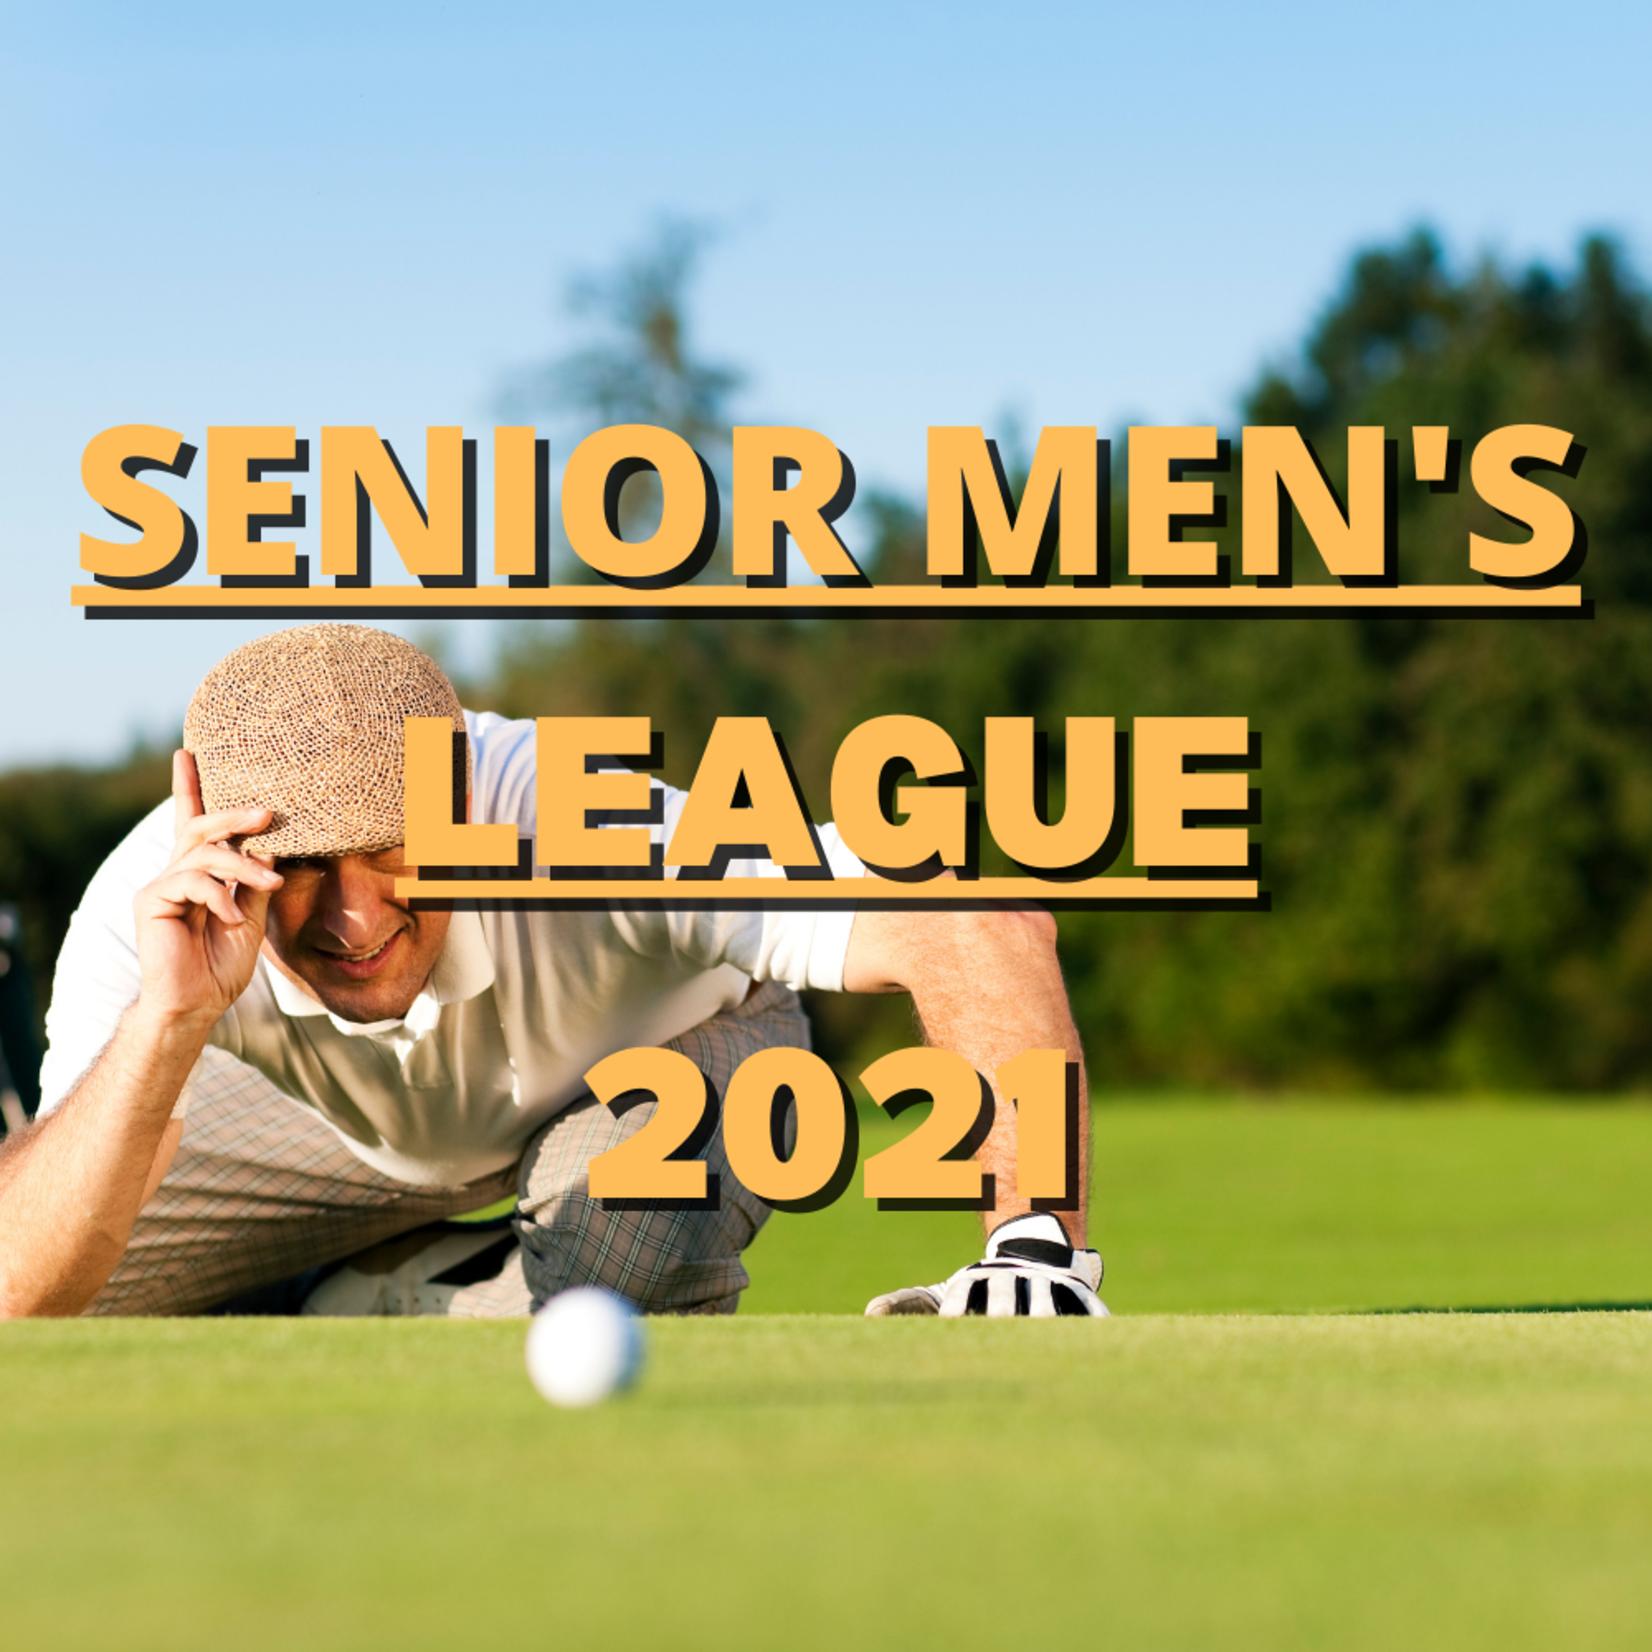 Senior Men's League 2021